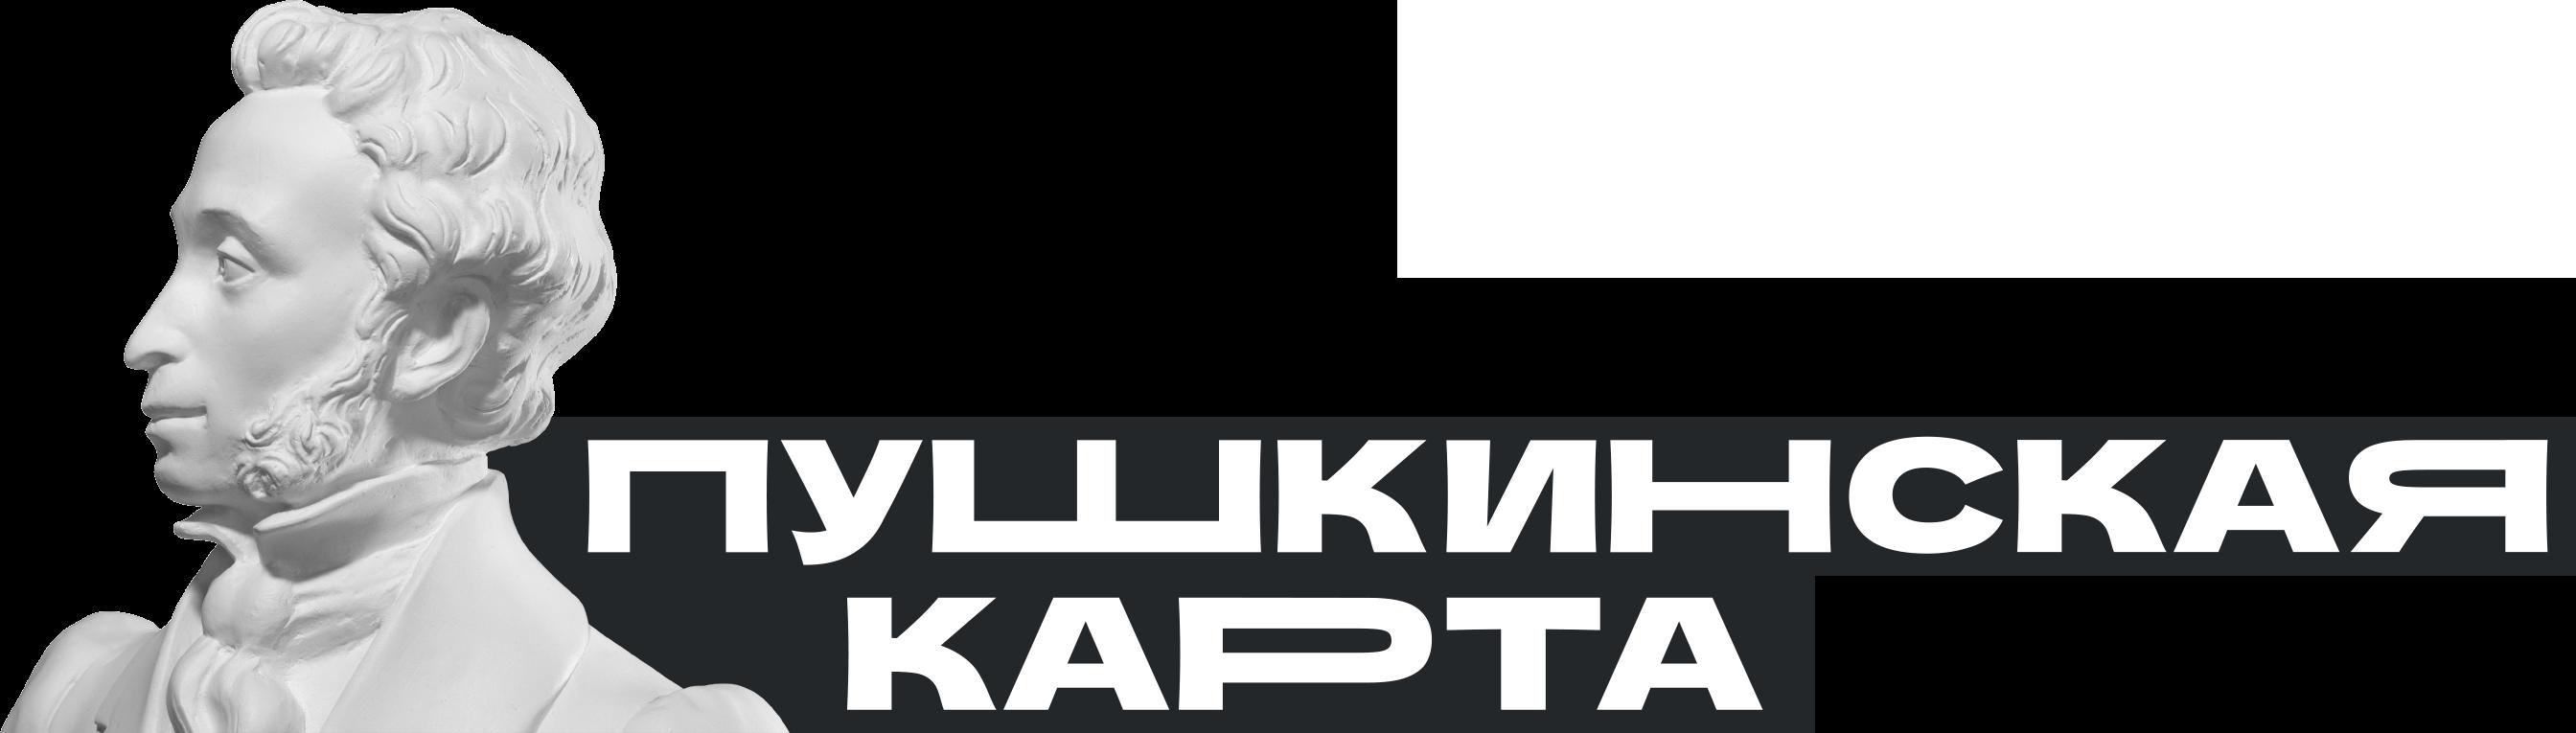 Лого Пушкинская карта